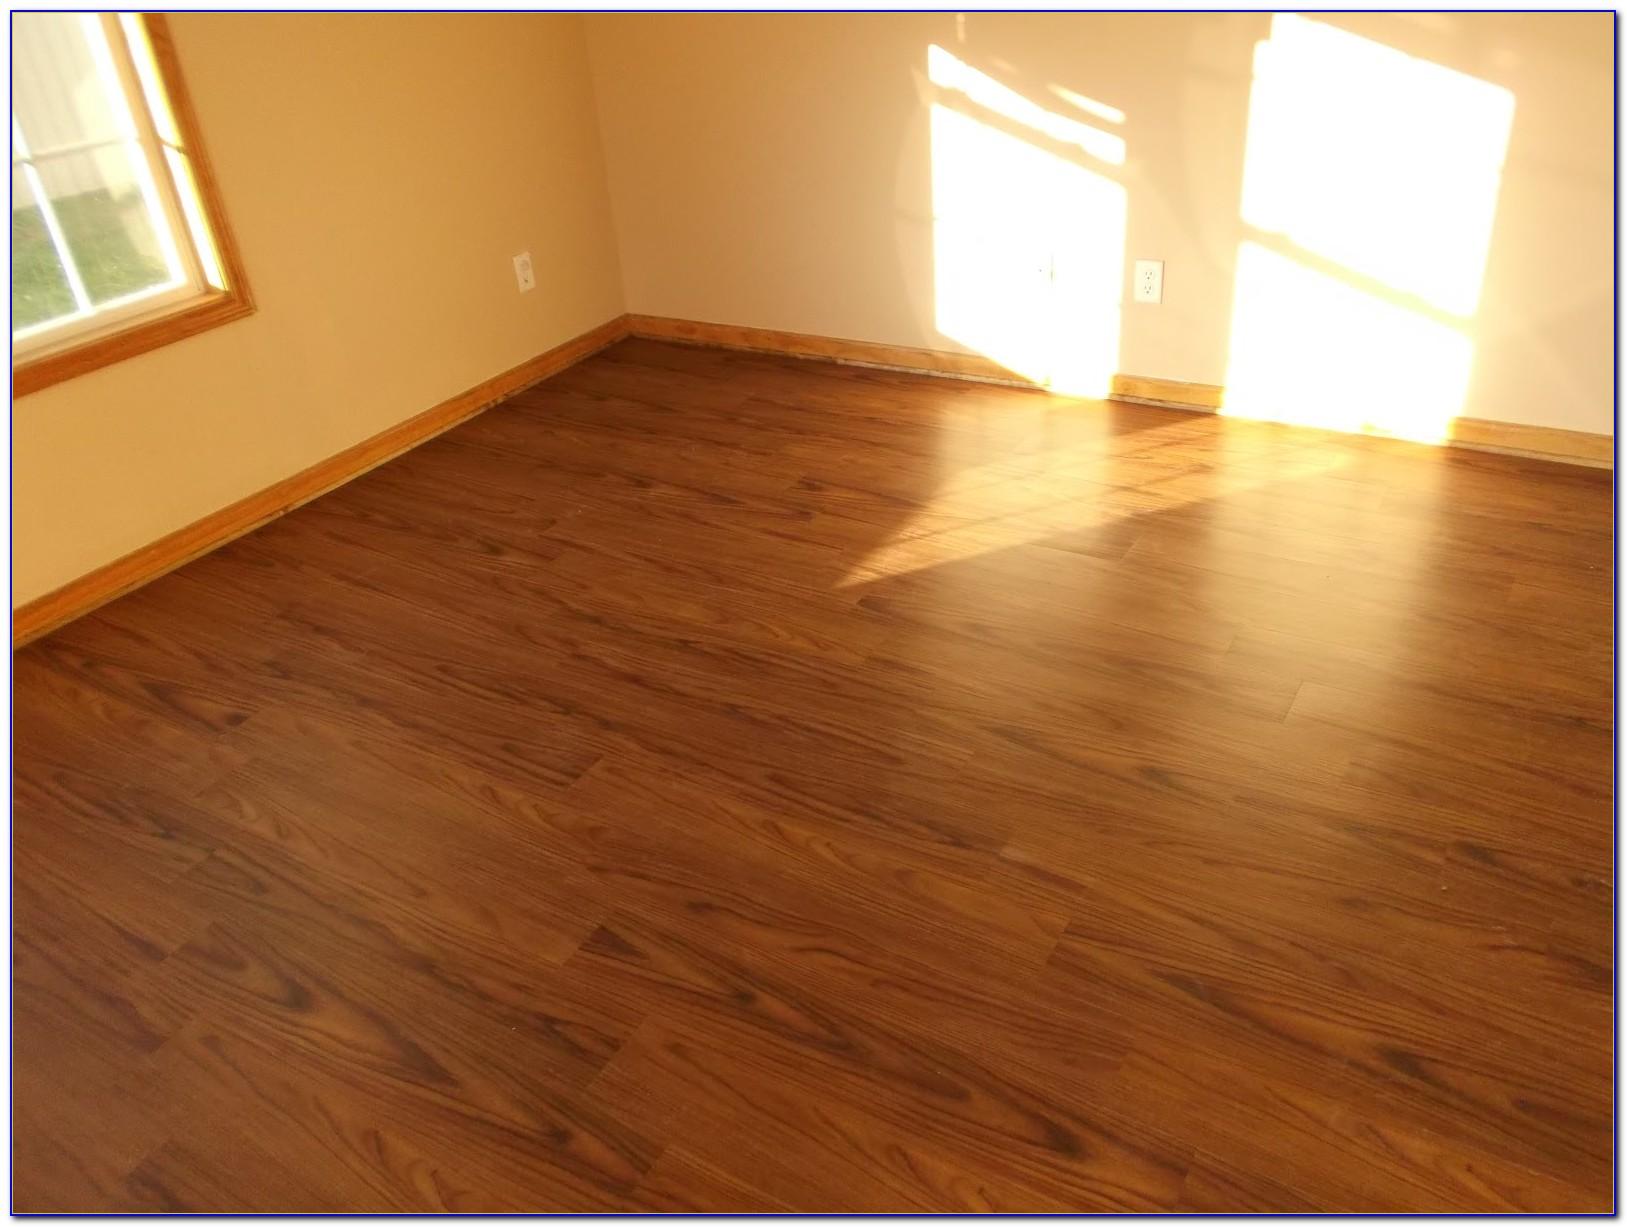 Trafficmaster Allure Vinyl Plank Flooring Country Pine